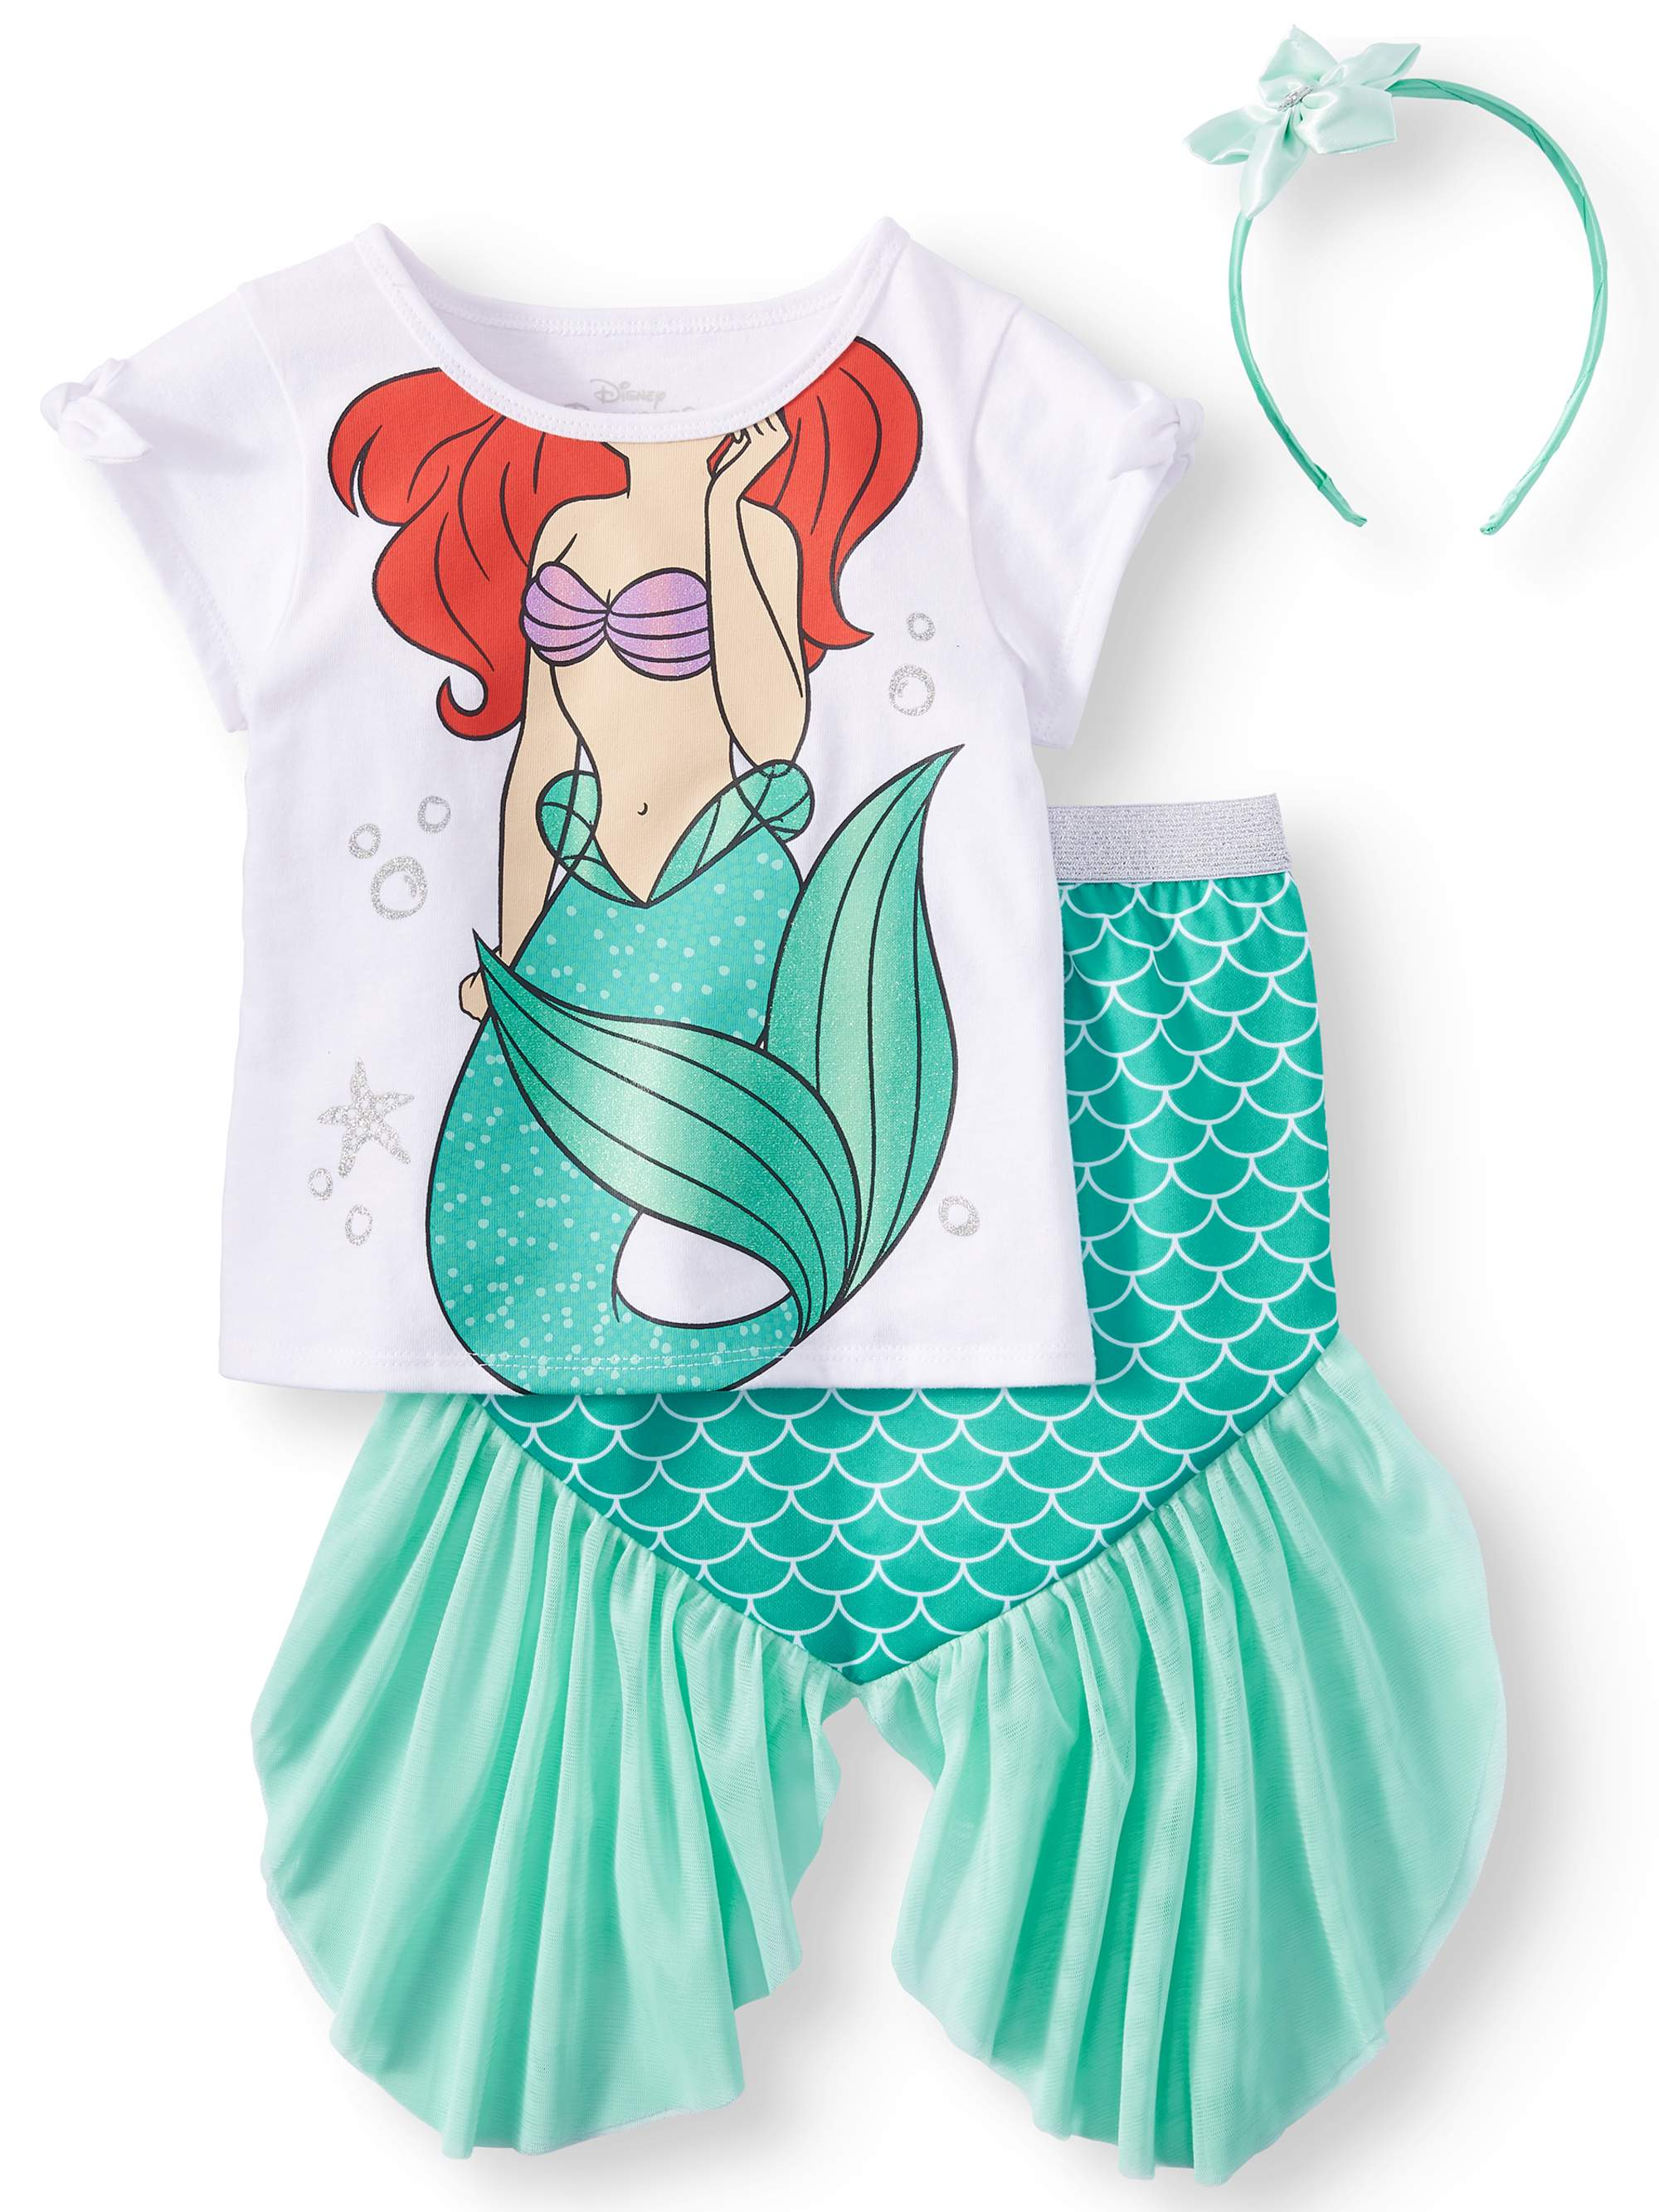 15b92810d6 The Little Mermaid T-Shirt, Tutu Skirt, & Headband, 3pc Outfit Set ...